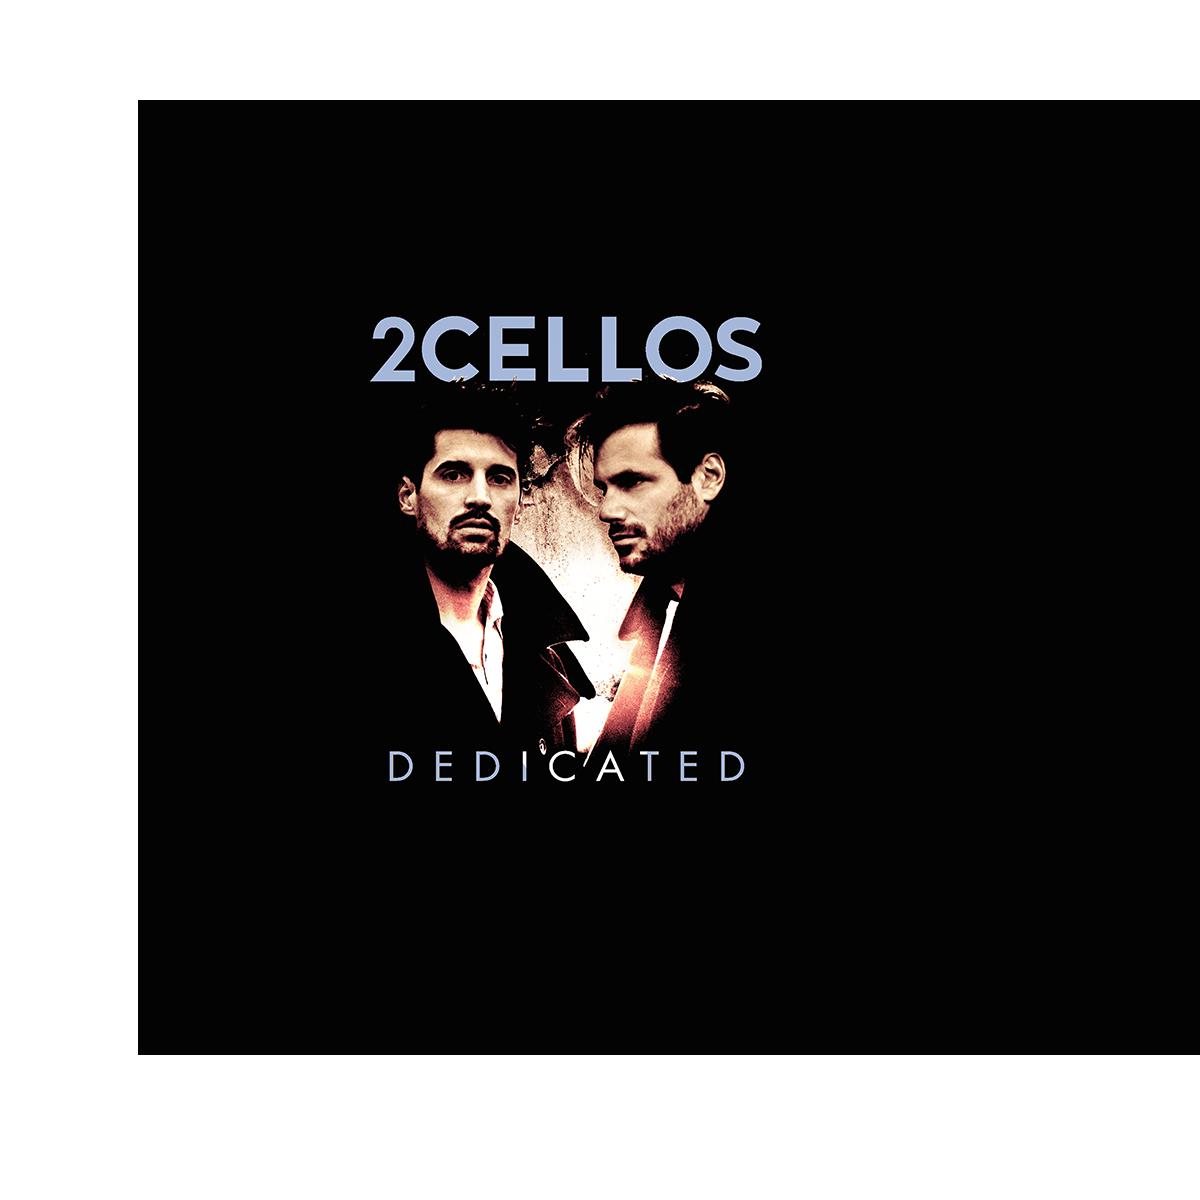 Buy Online 2 Cellos - 2CELLOS Dedicated Photo Black T-Shirt